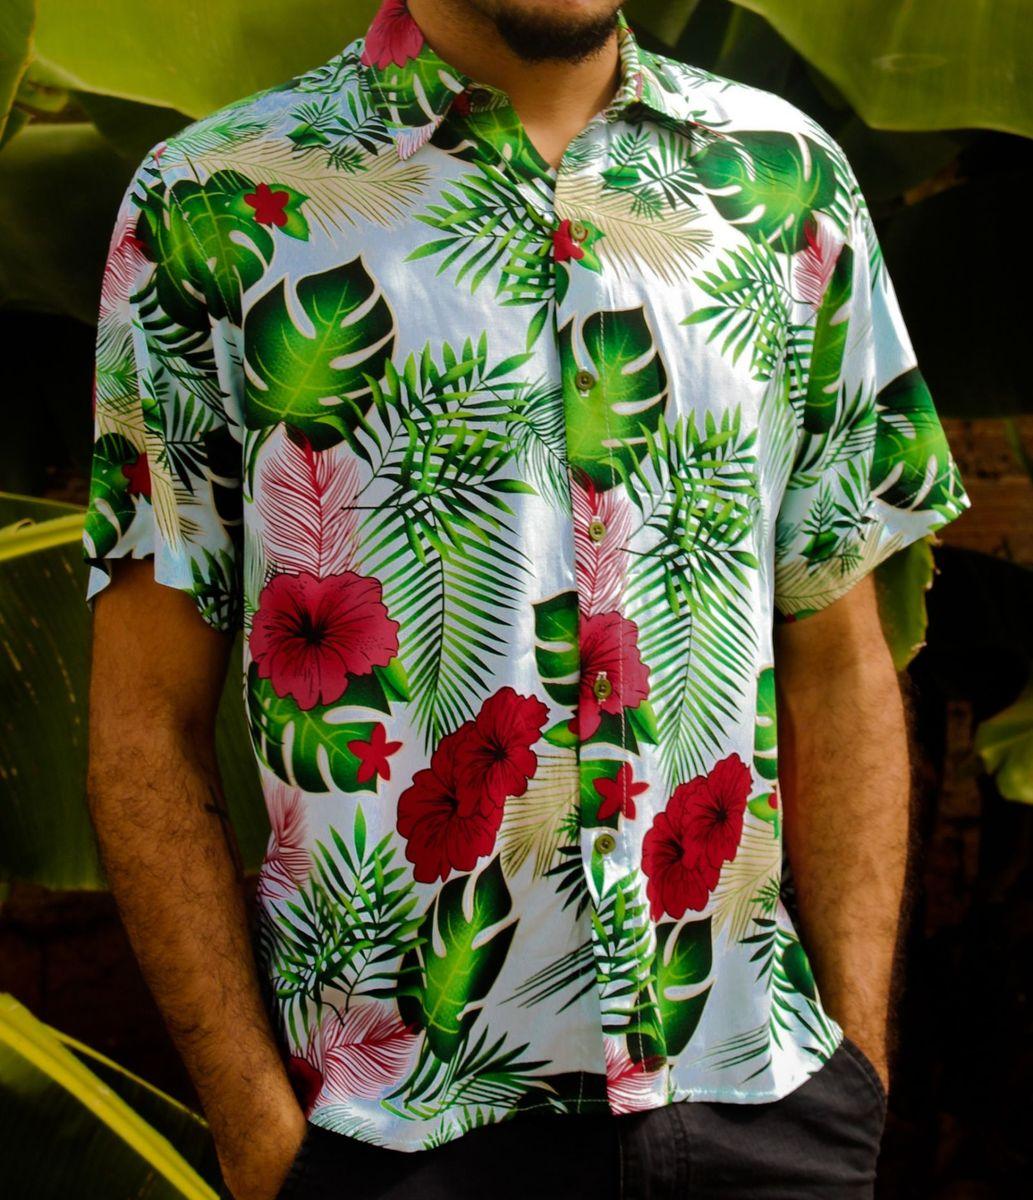 camisa floral - p - camisas sem marca